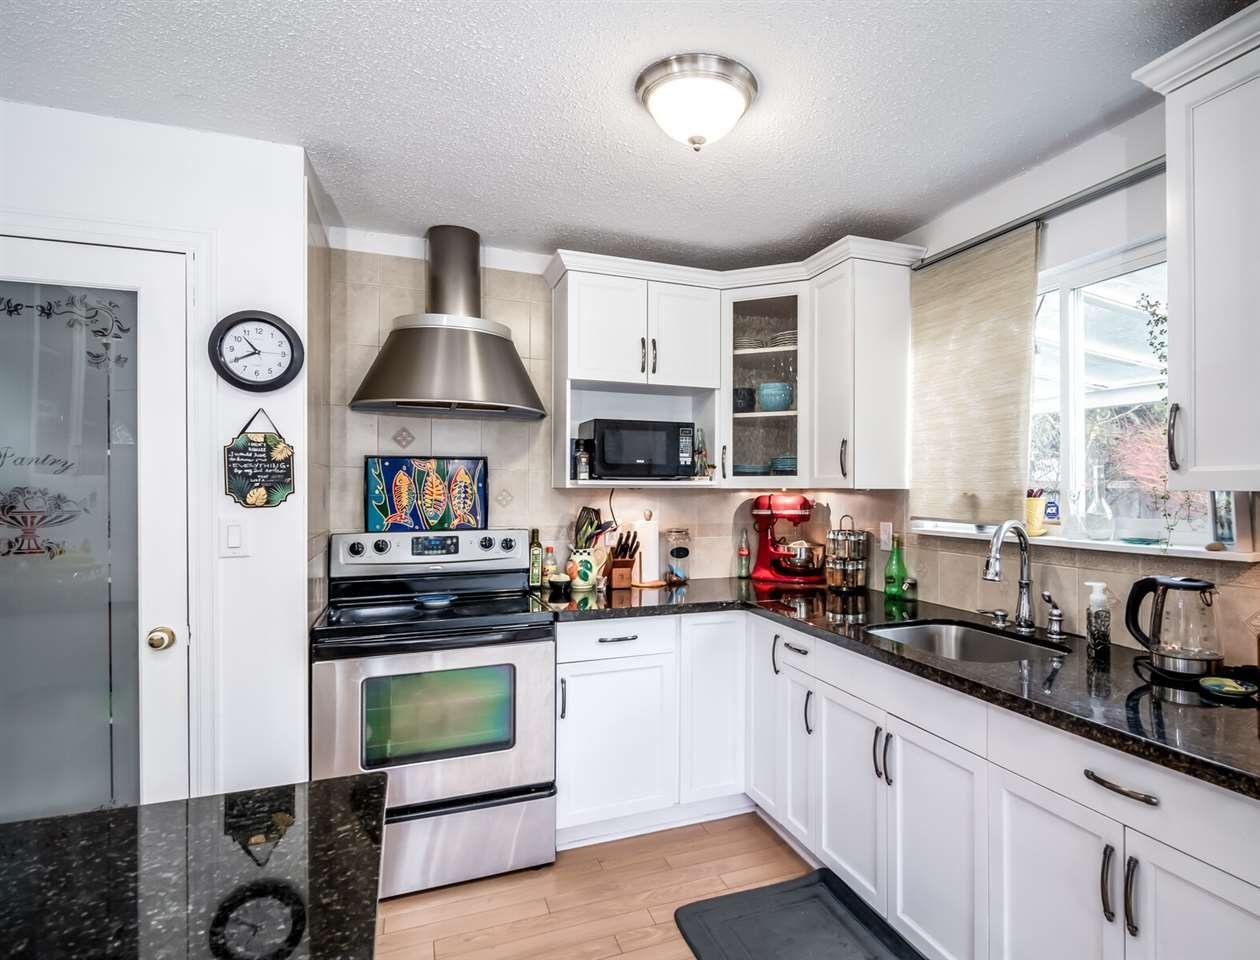 Main Photo: 21075 122 Avenue in Maple Ridge: Northwest Maple Ridge House for sale : MLS®# R2534001